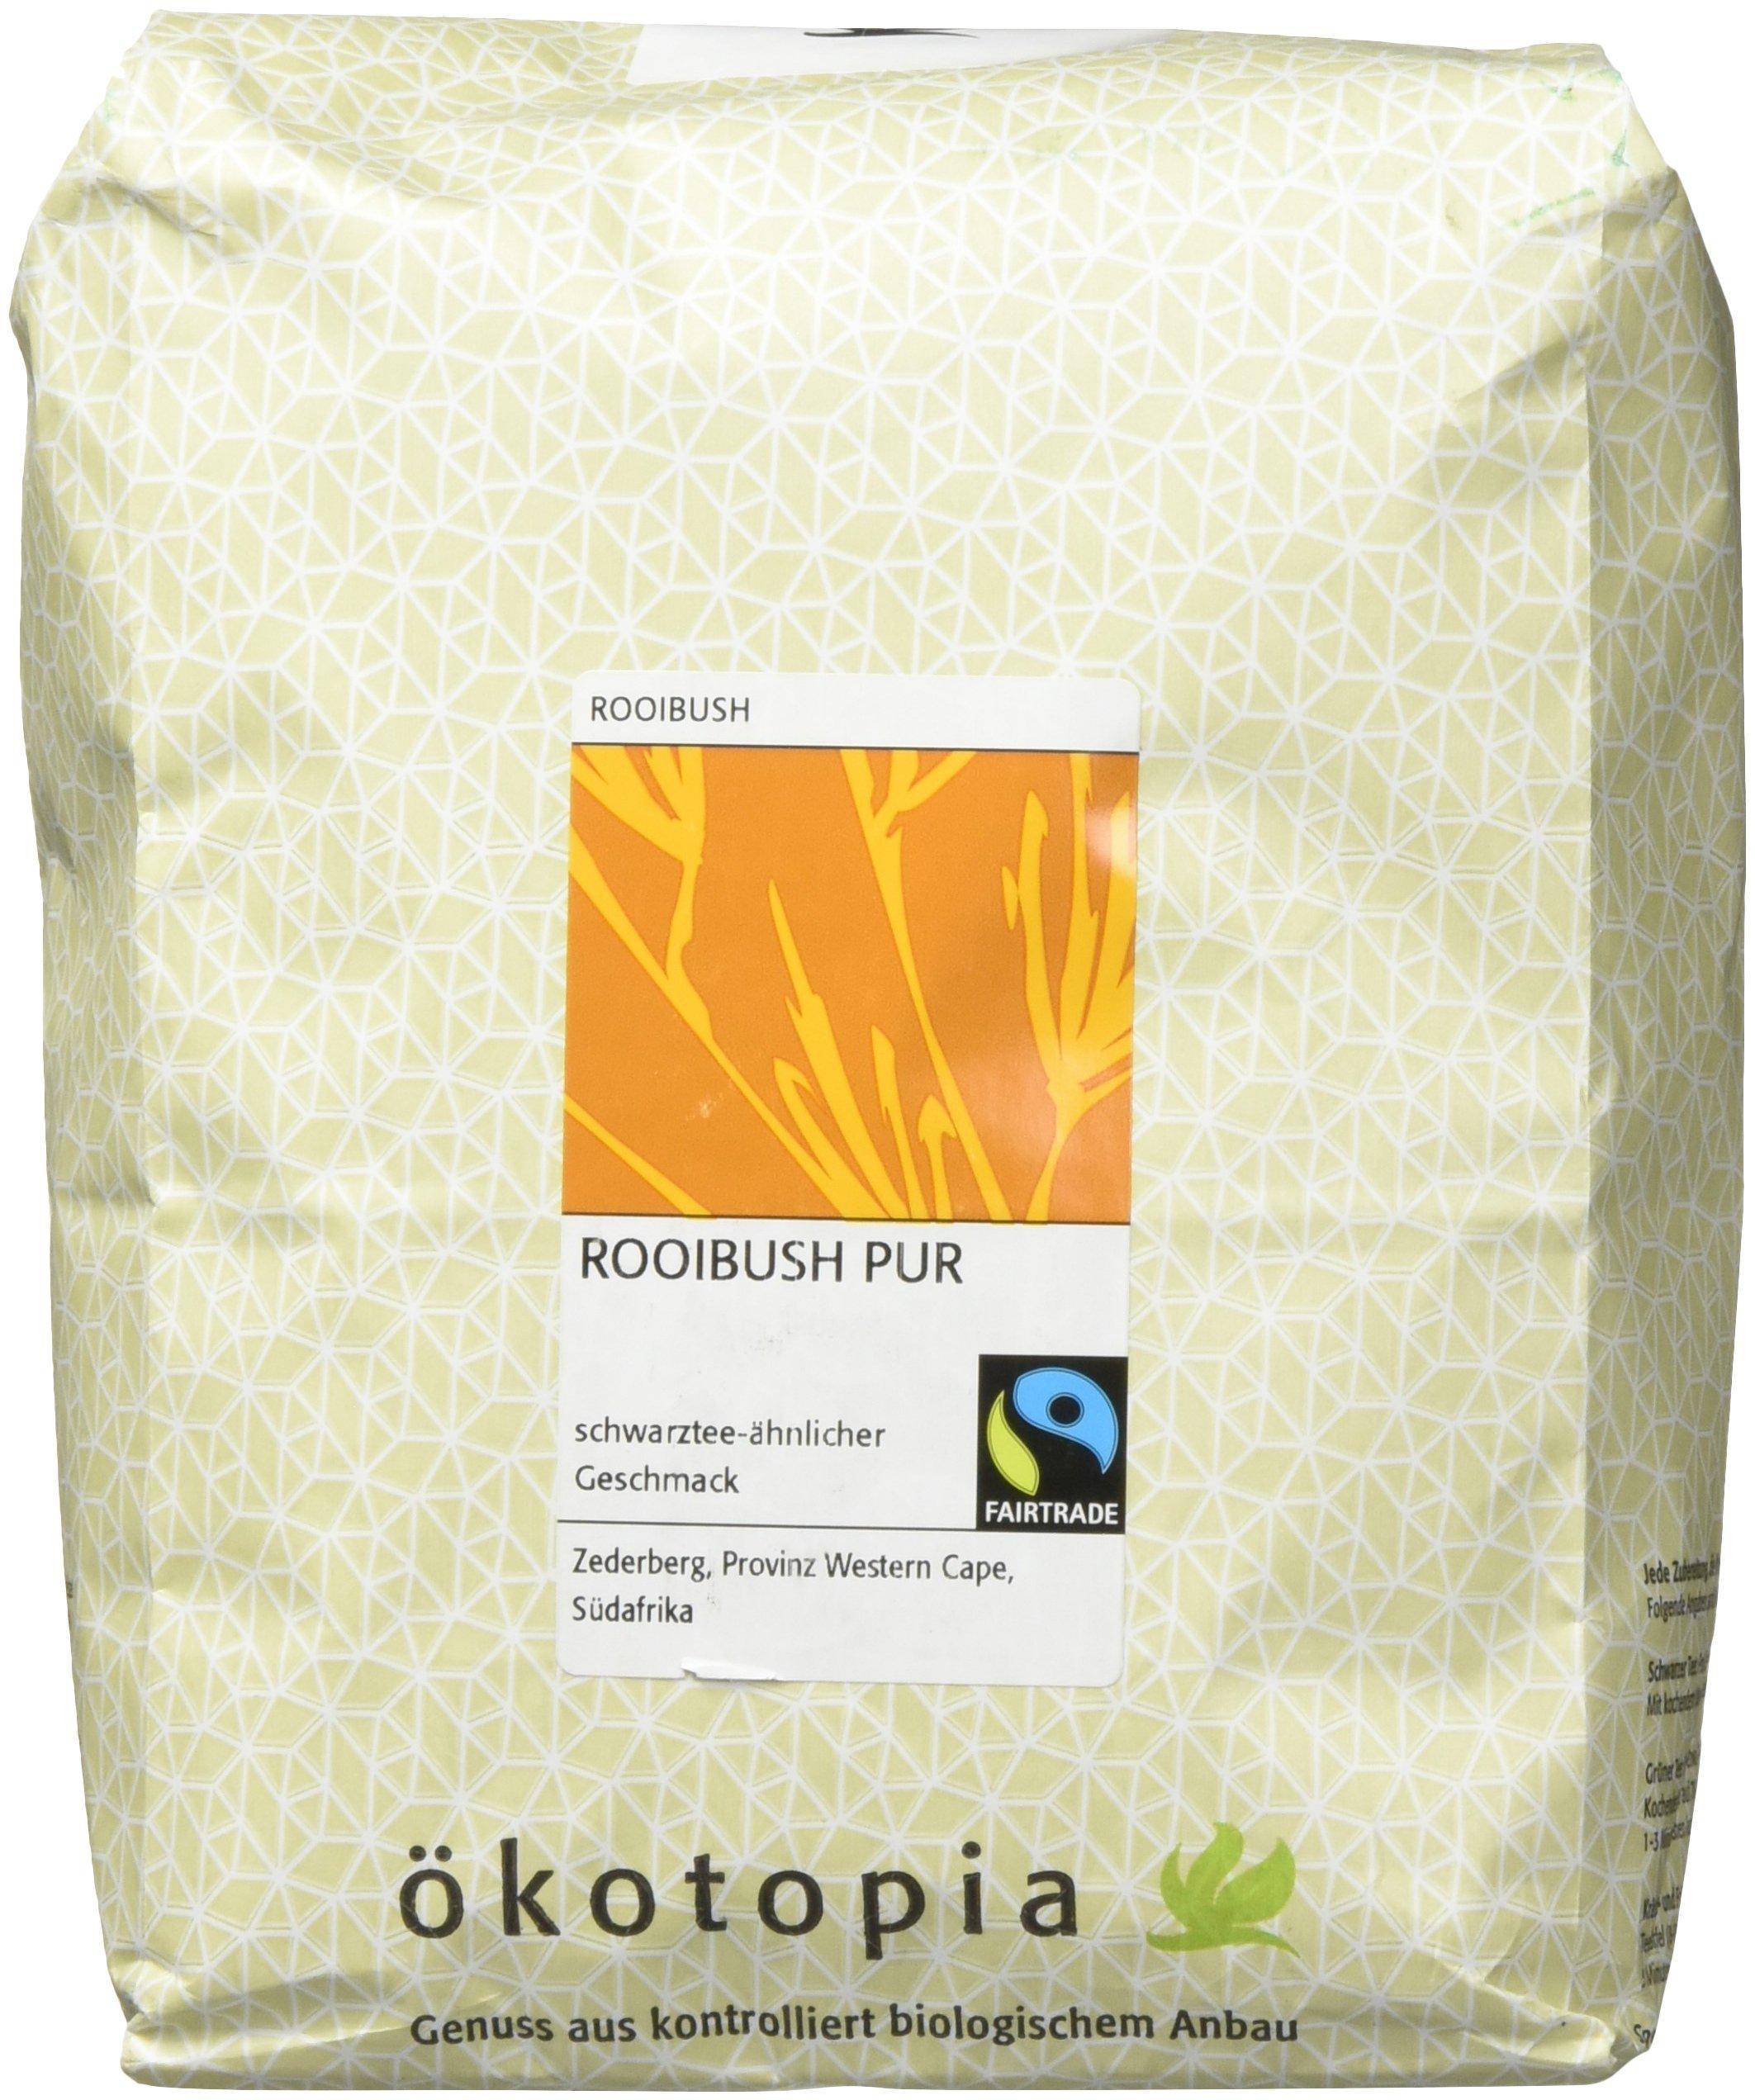 kotopia-Roibusch-Tee-Rooibush-pur-1er-Pack-1-x-1000-g